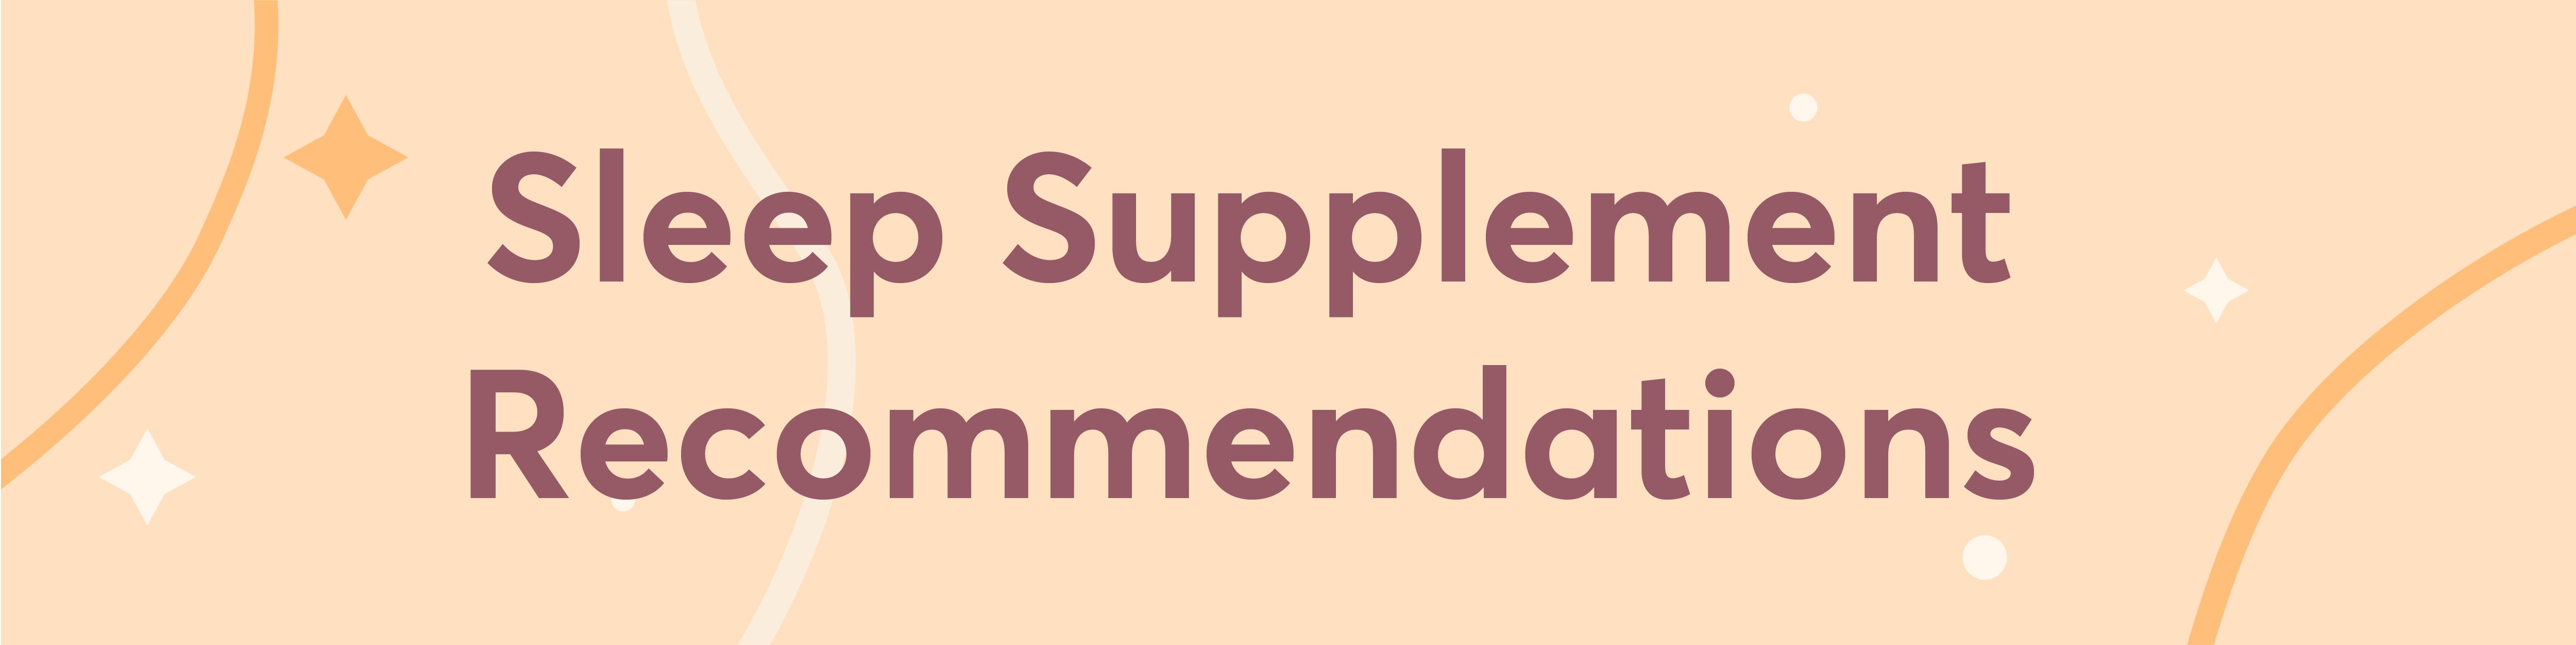 Shleep Sleep Supplement Recommendations